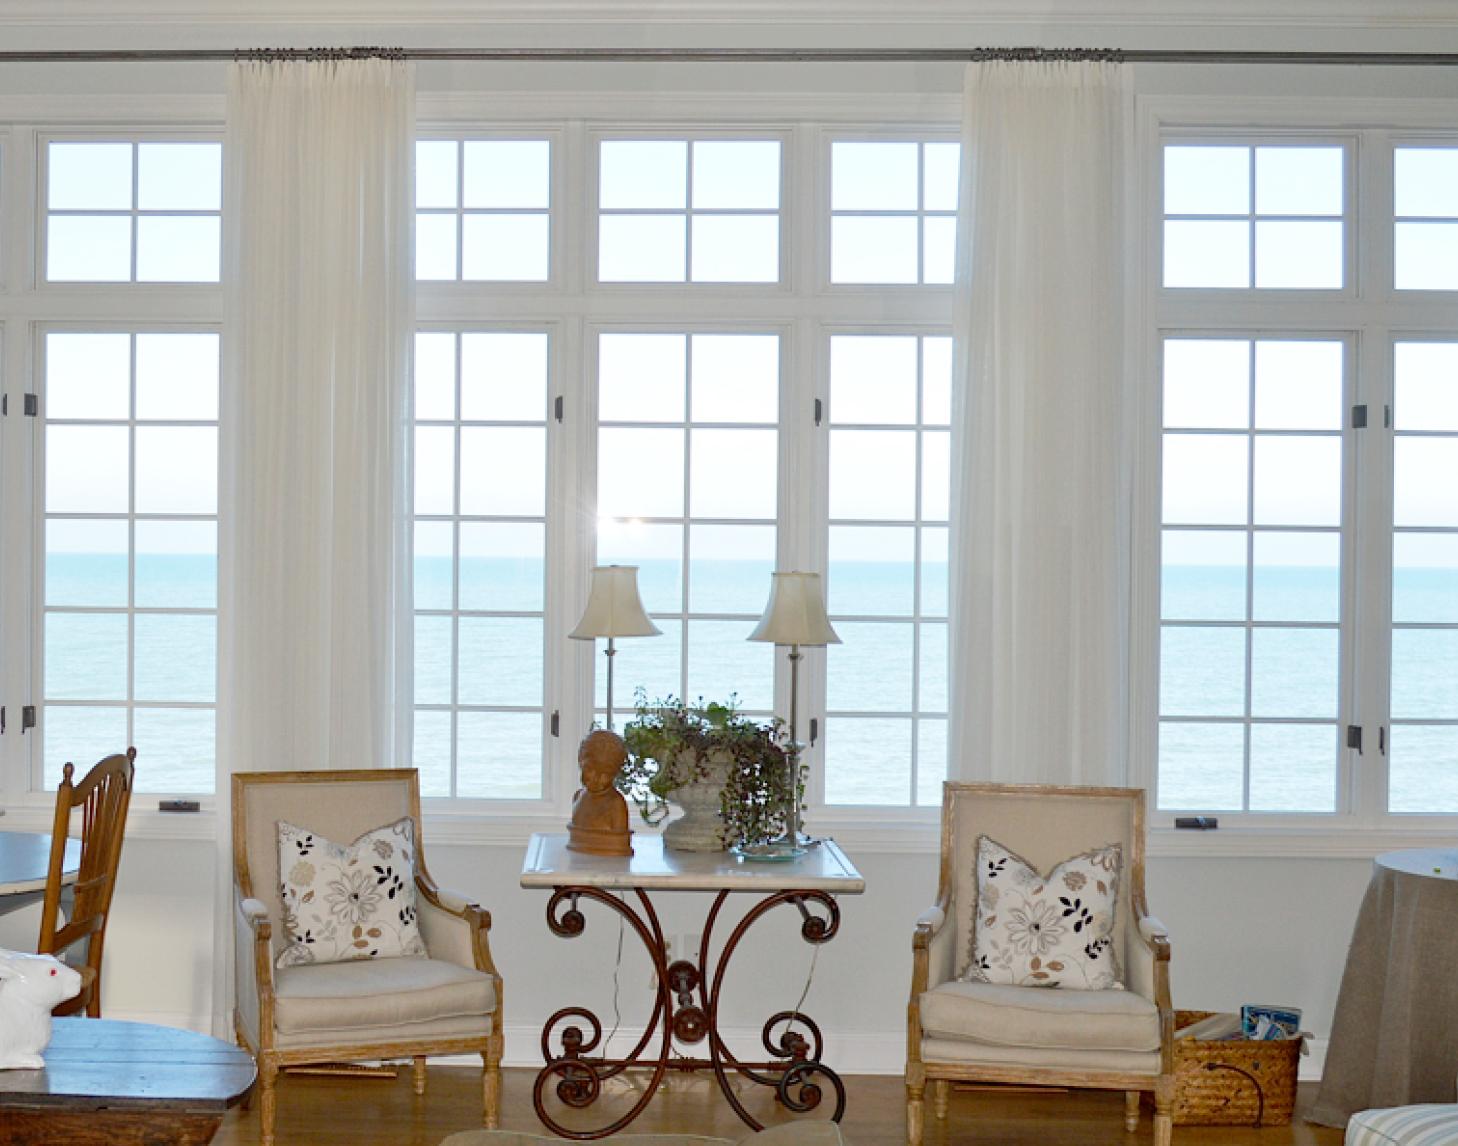 Window Treatments by Lake Interiors | © Lake Interiors Inc.